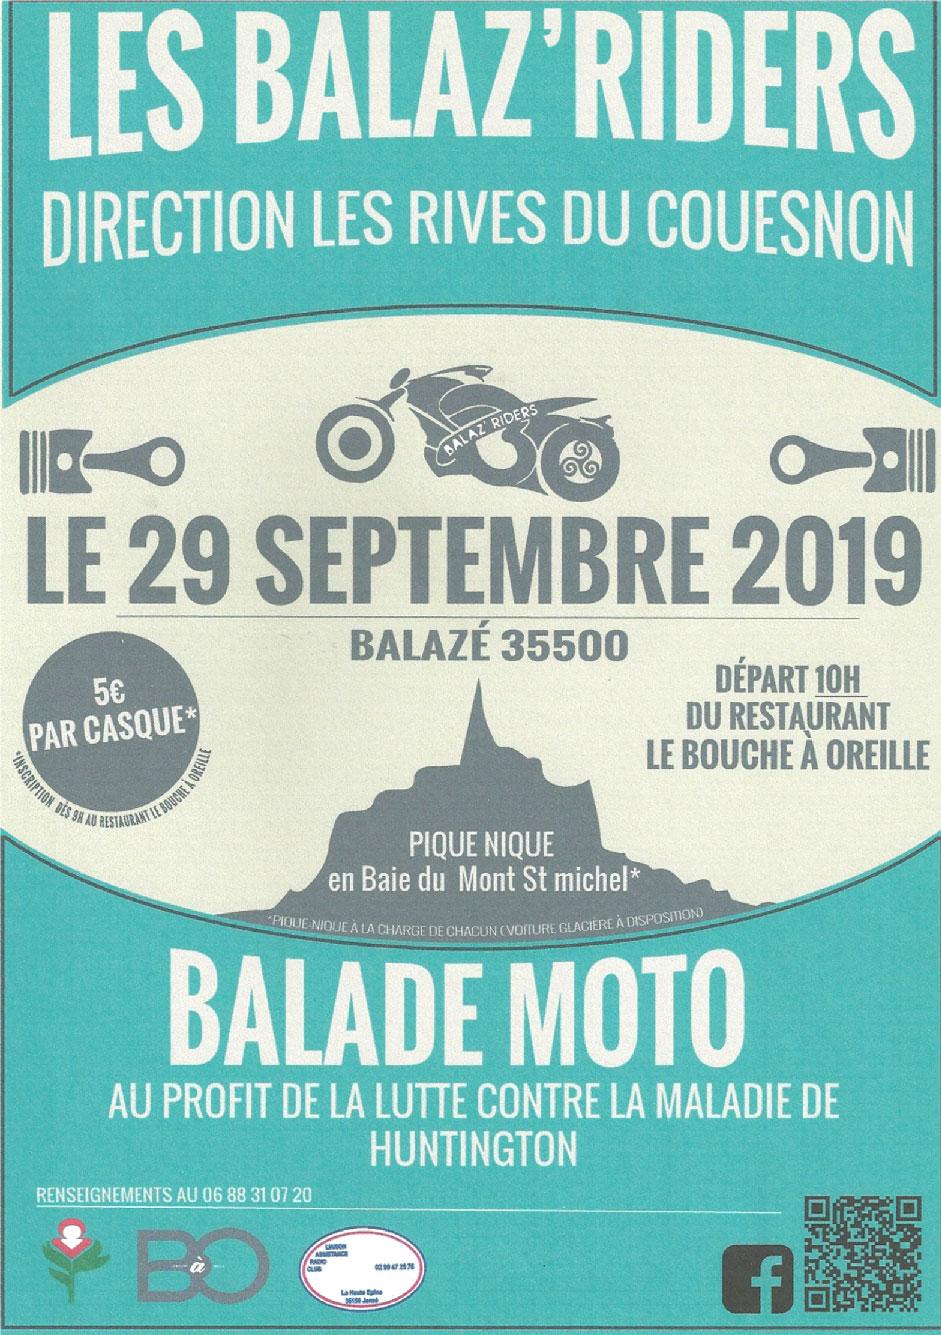 MANIFESTATION - Balade Moto - Dimanche 29 Septembre 2019 - Balazé (35500) Affich54